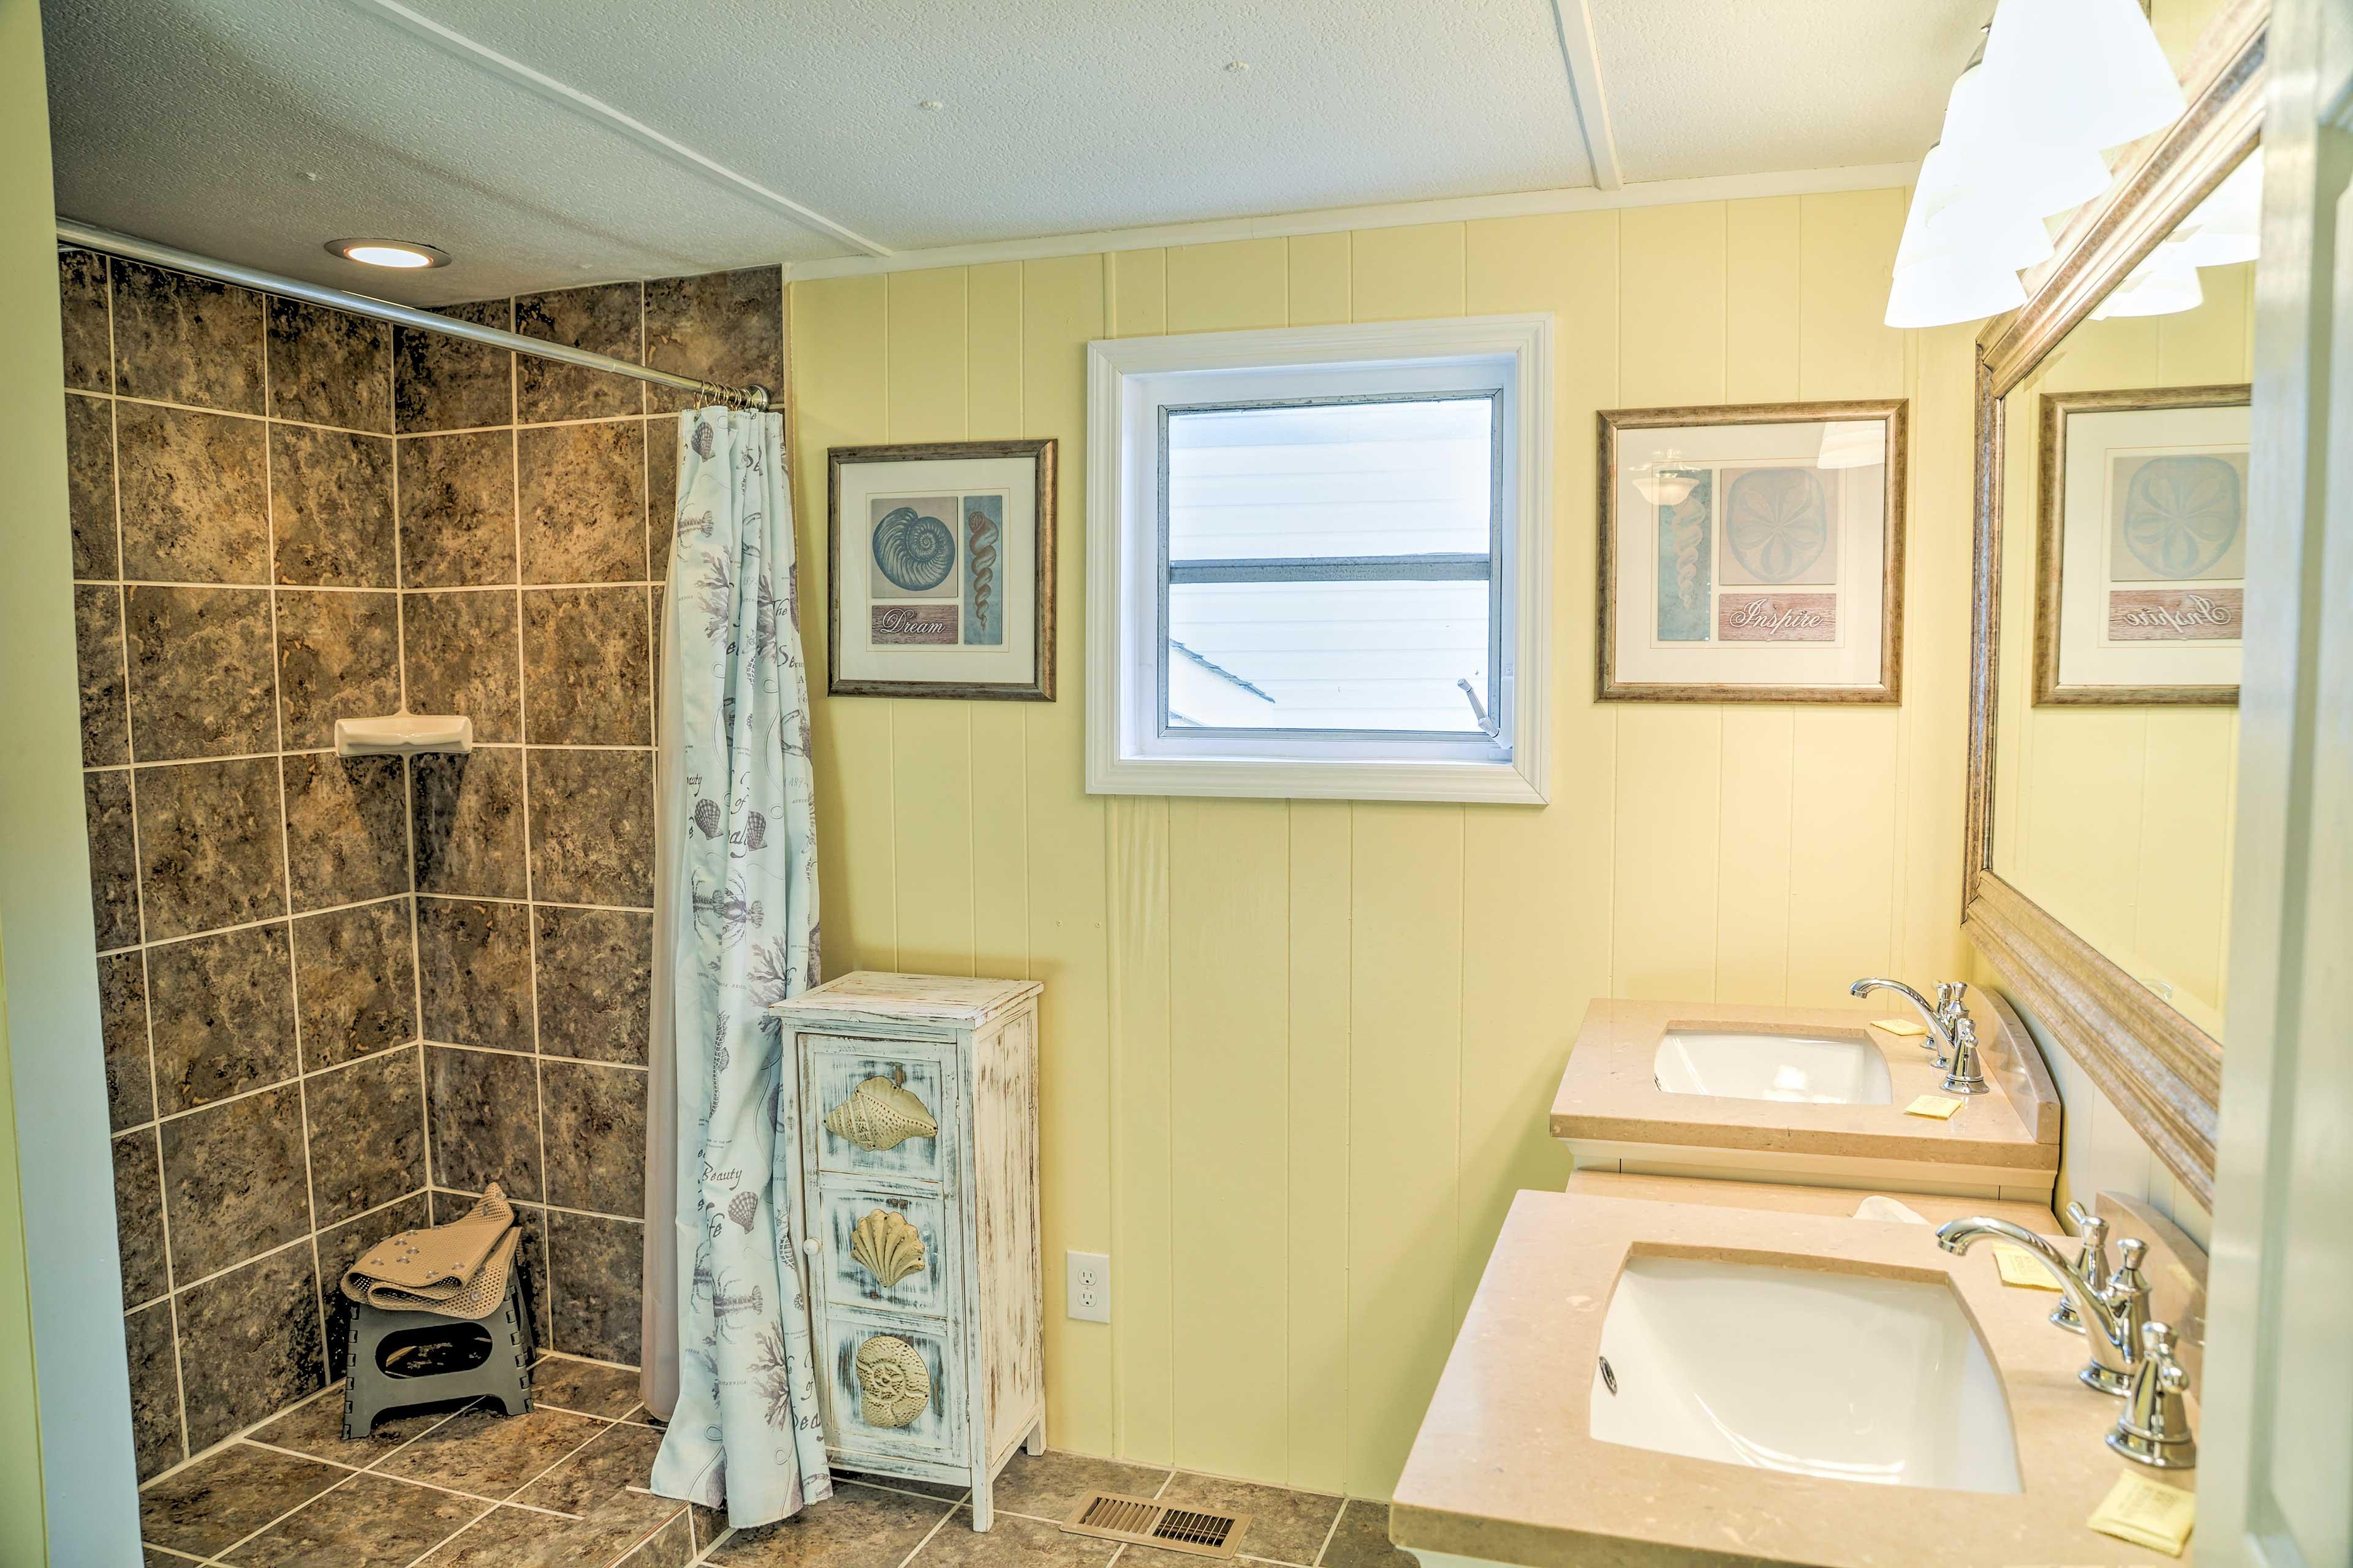 The master en-suite bathroom provides 2 separate vanities and a walk-in shower.